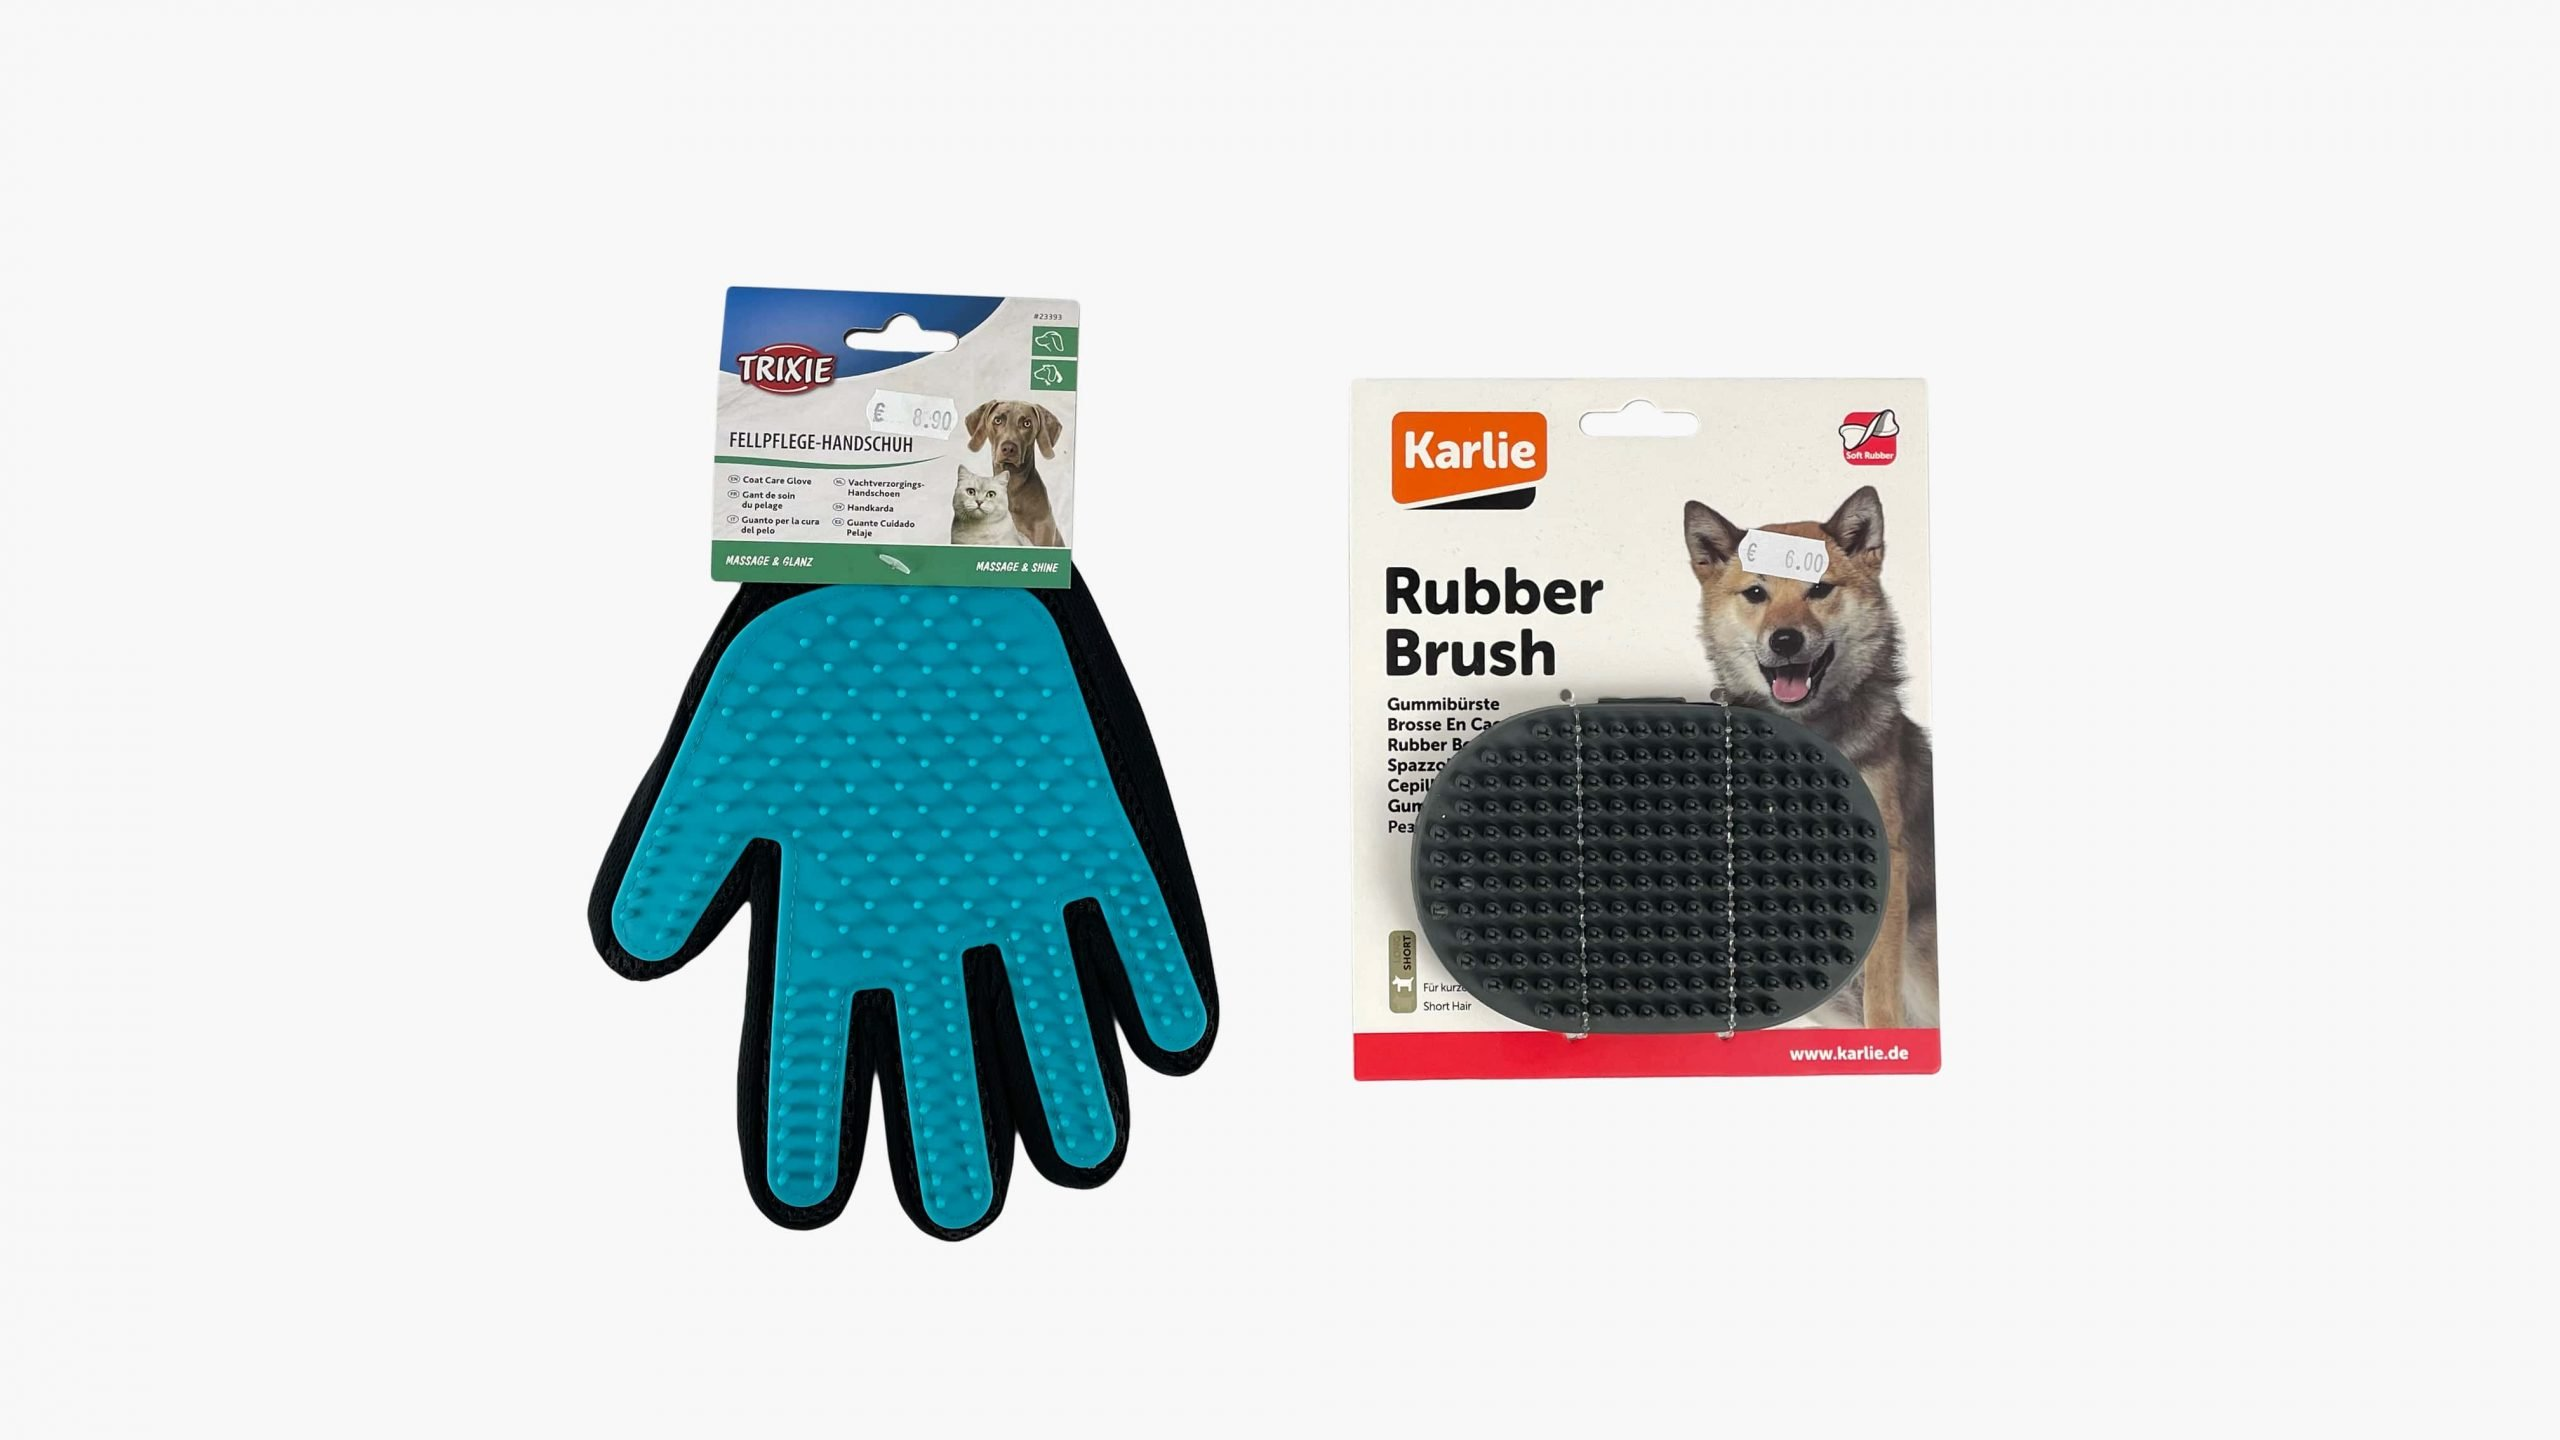 petpoint-rubber brush-karlie